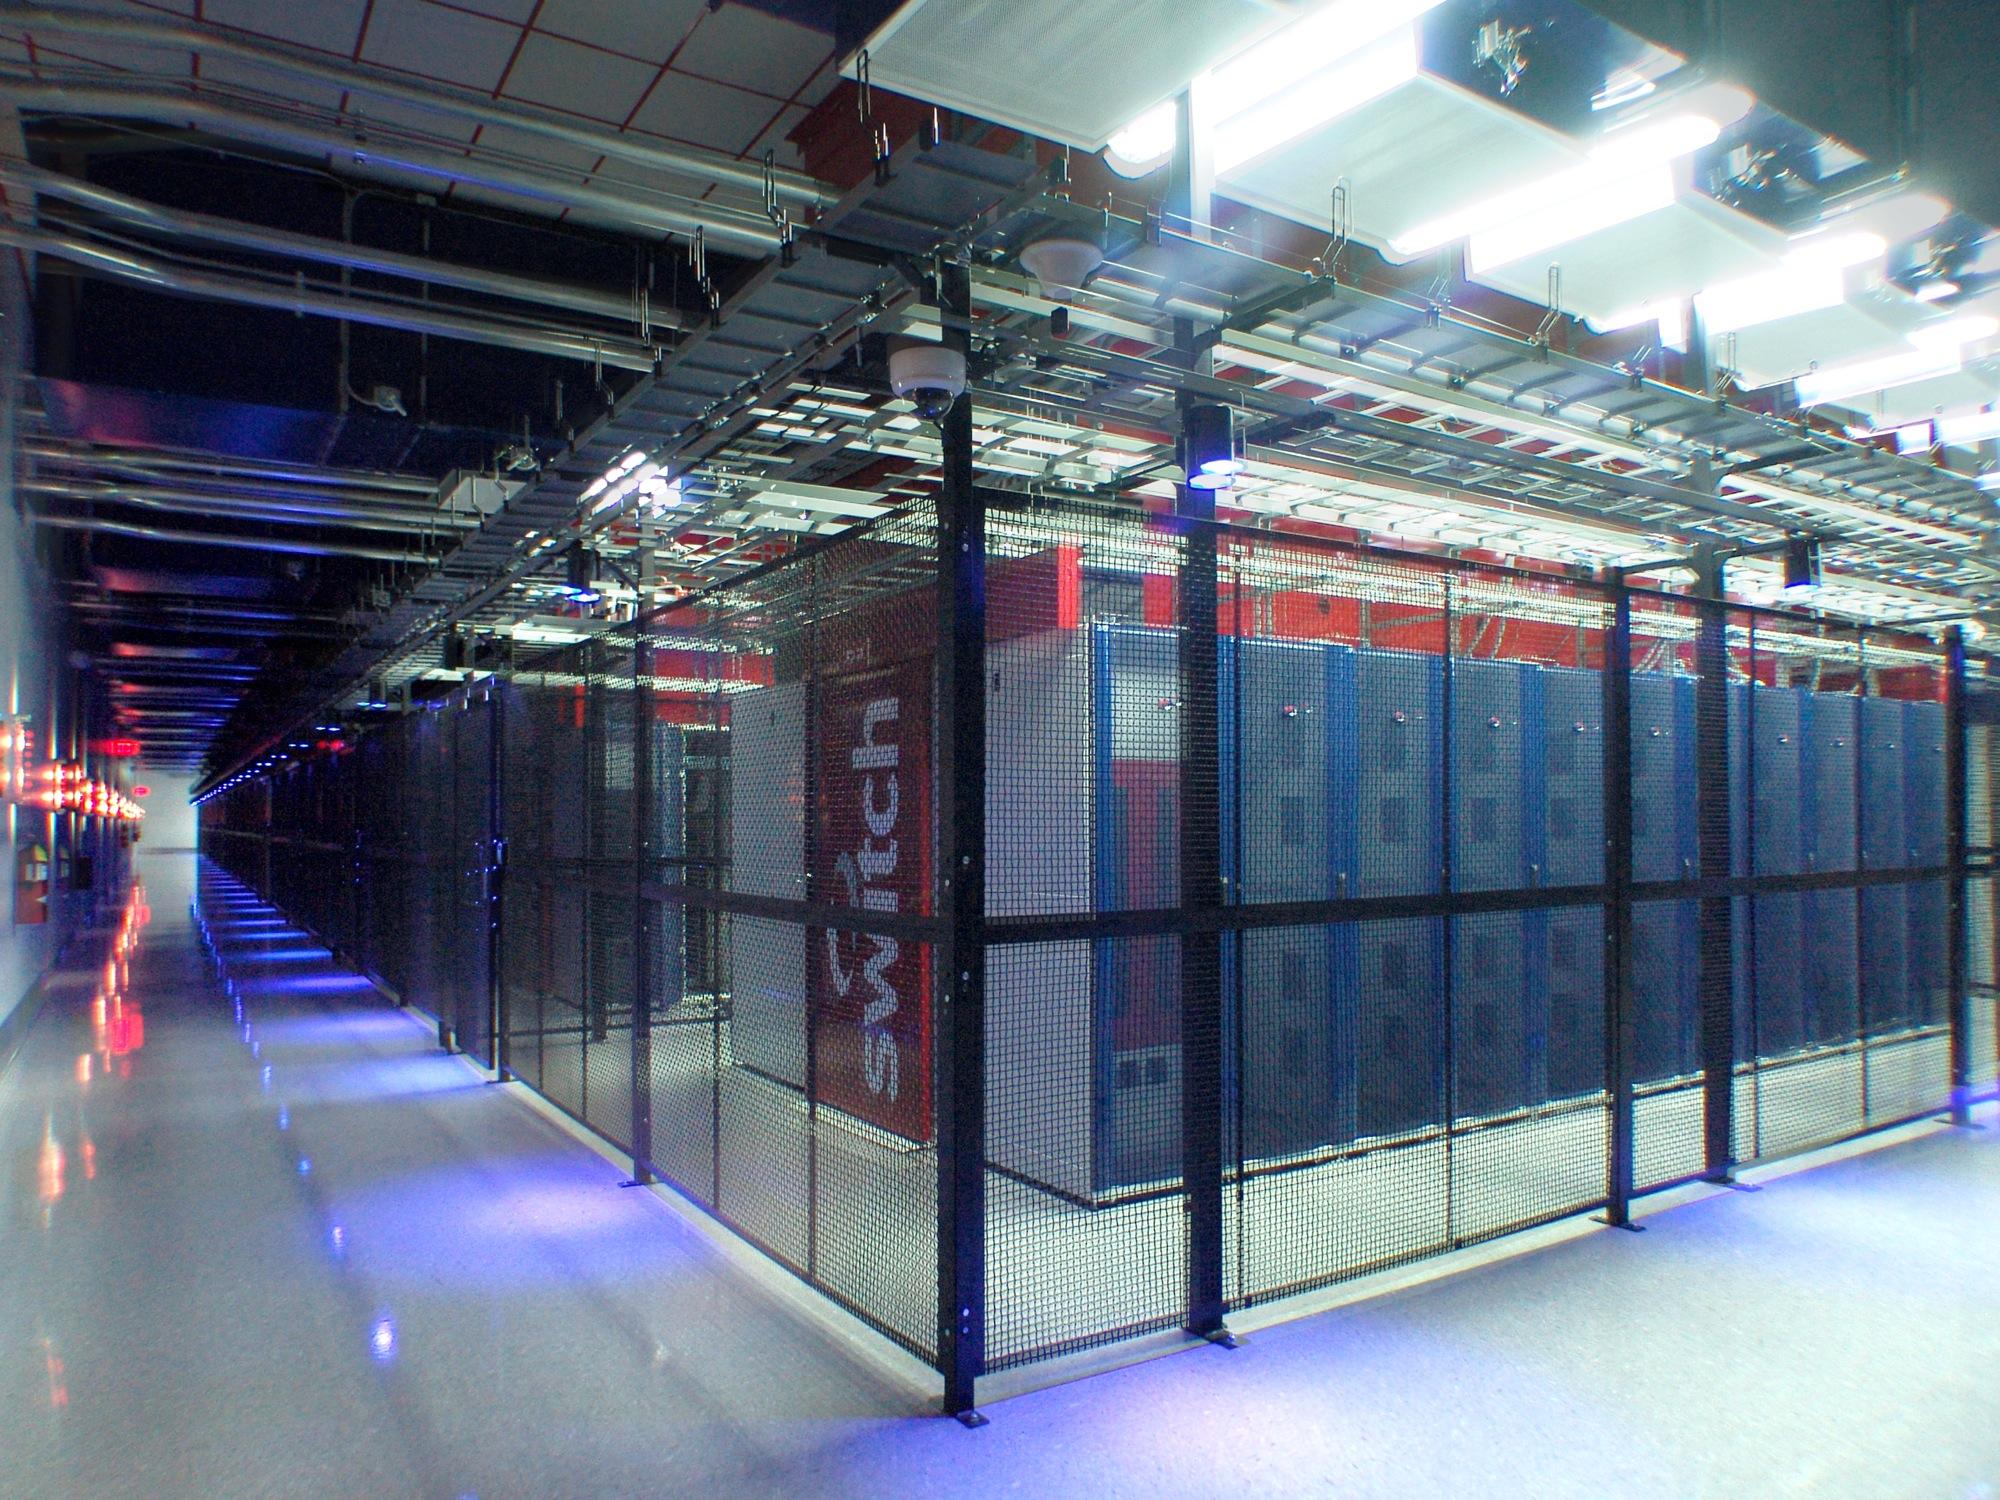 Switch's SuperNAP data center in Las Vegas